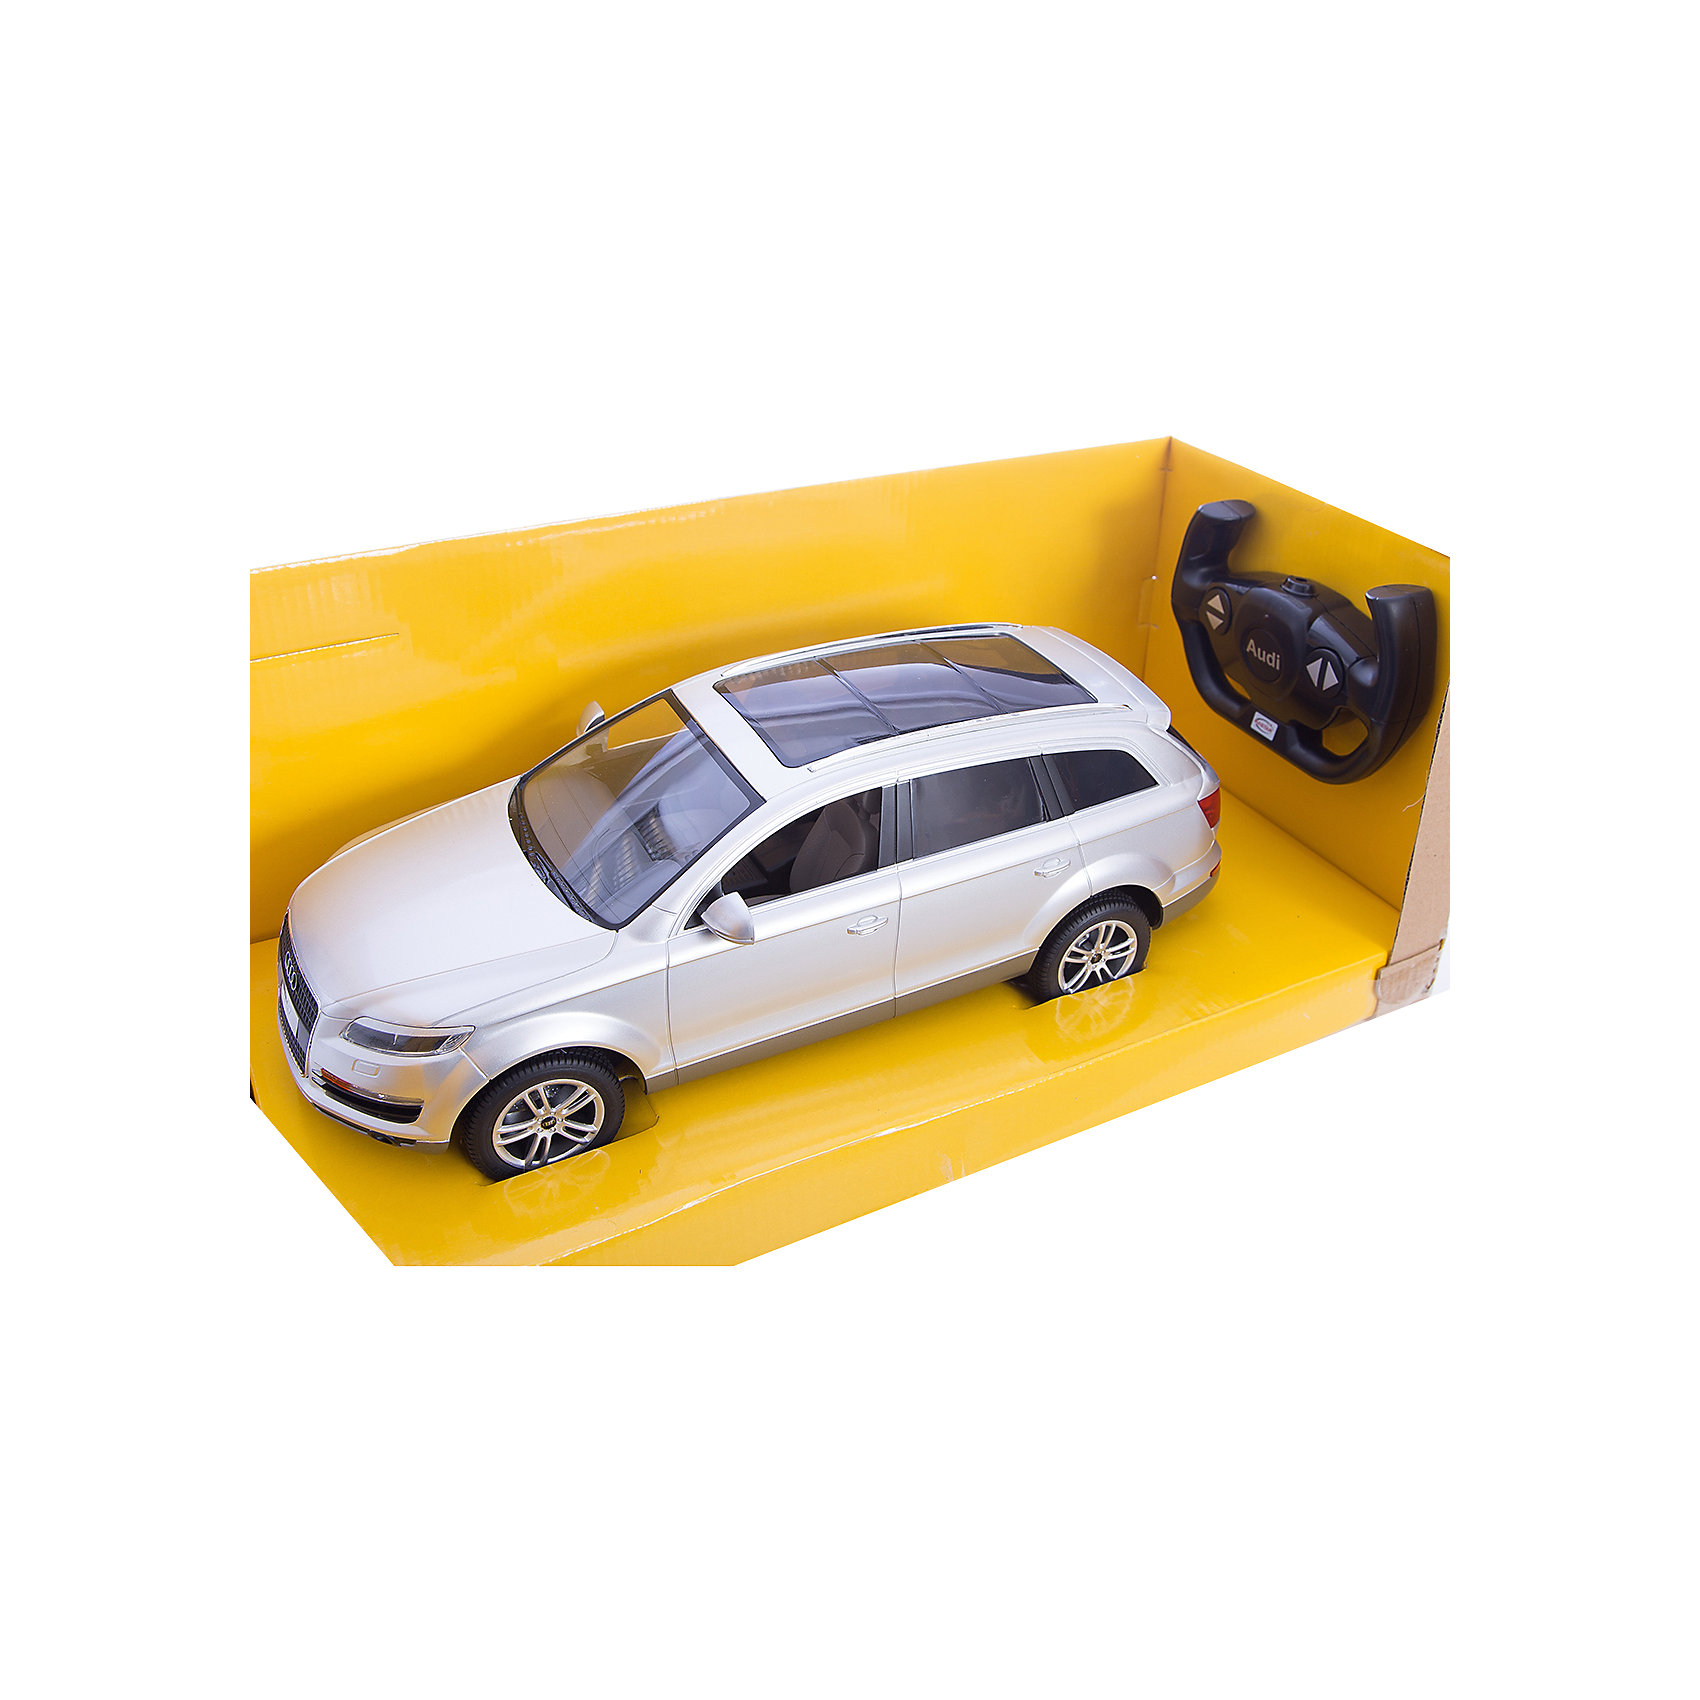 - Машина AUDI Q7 1:14, свет, на р/у, RASTAR, серебристый купить автомобиль б у в донецке до 33000 грн